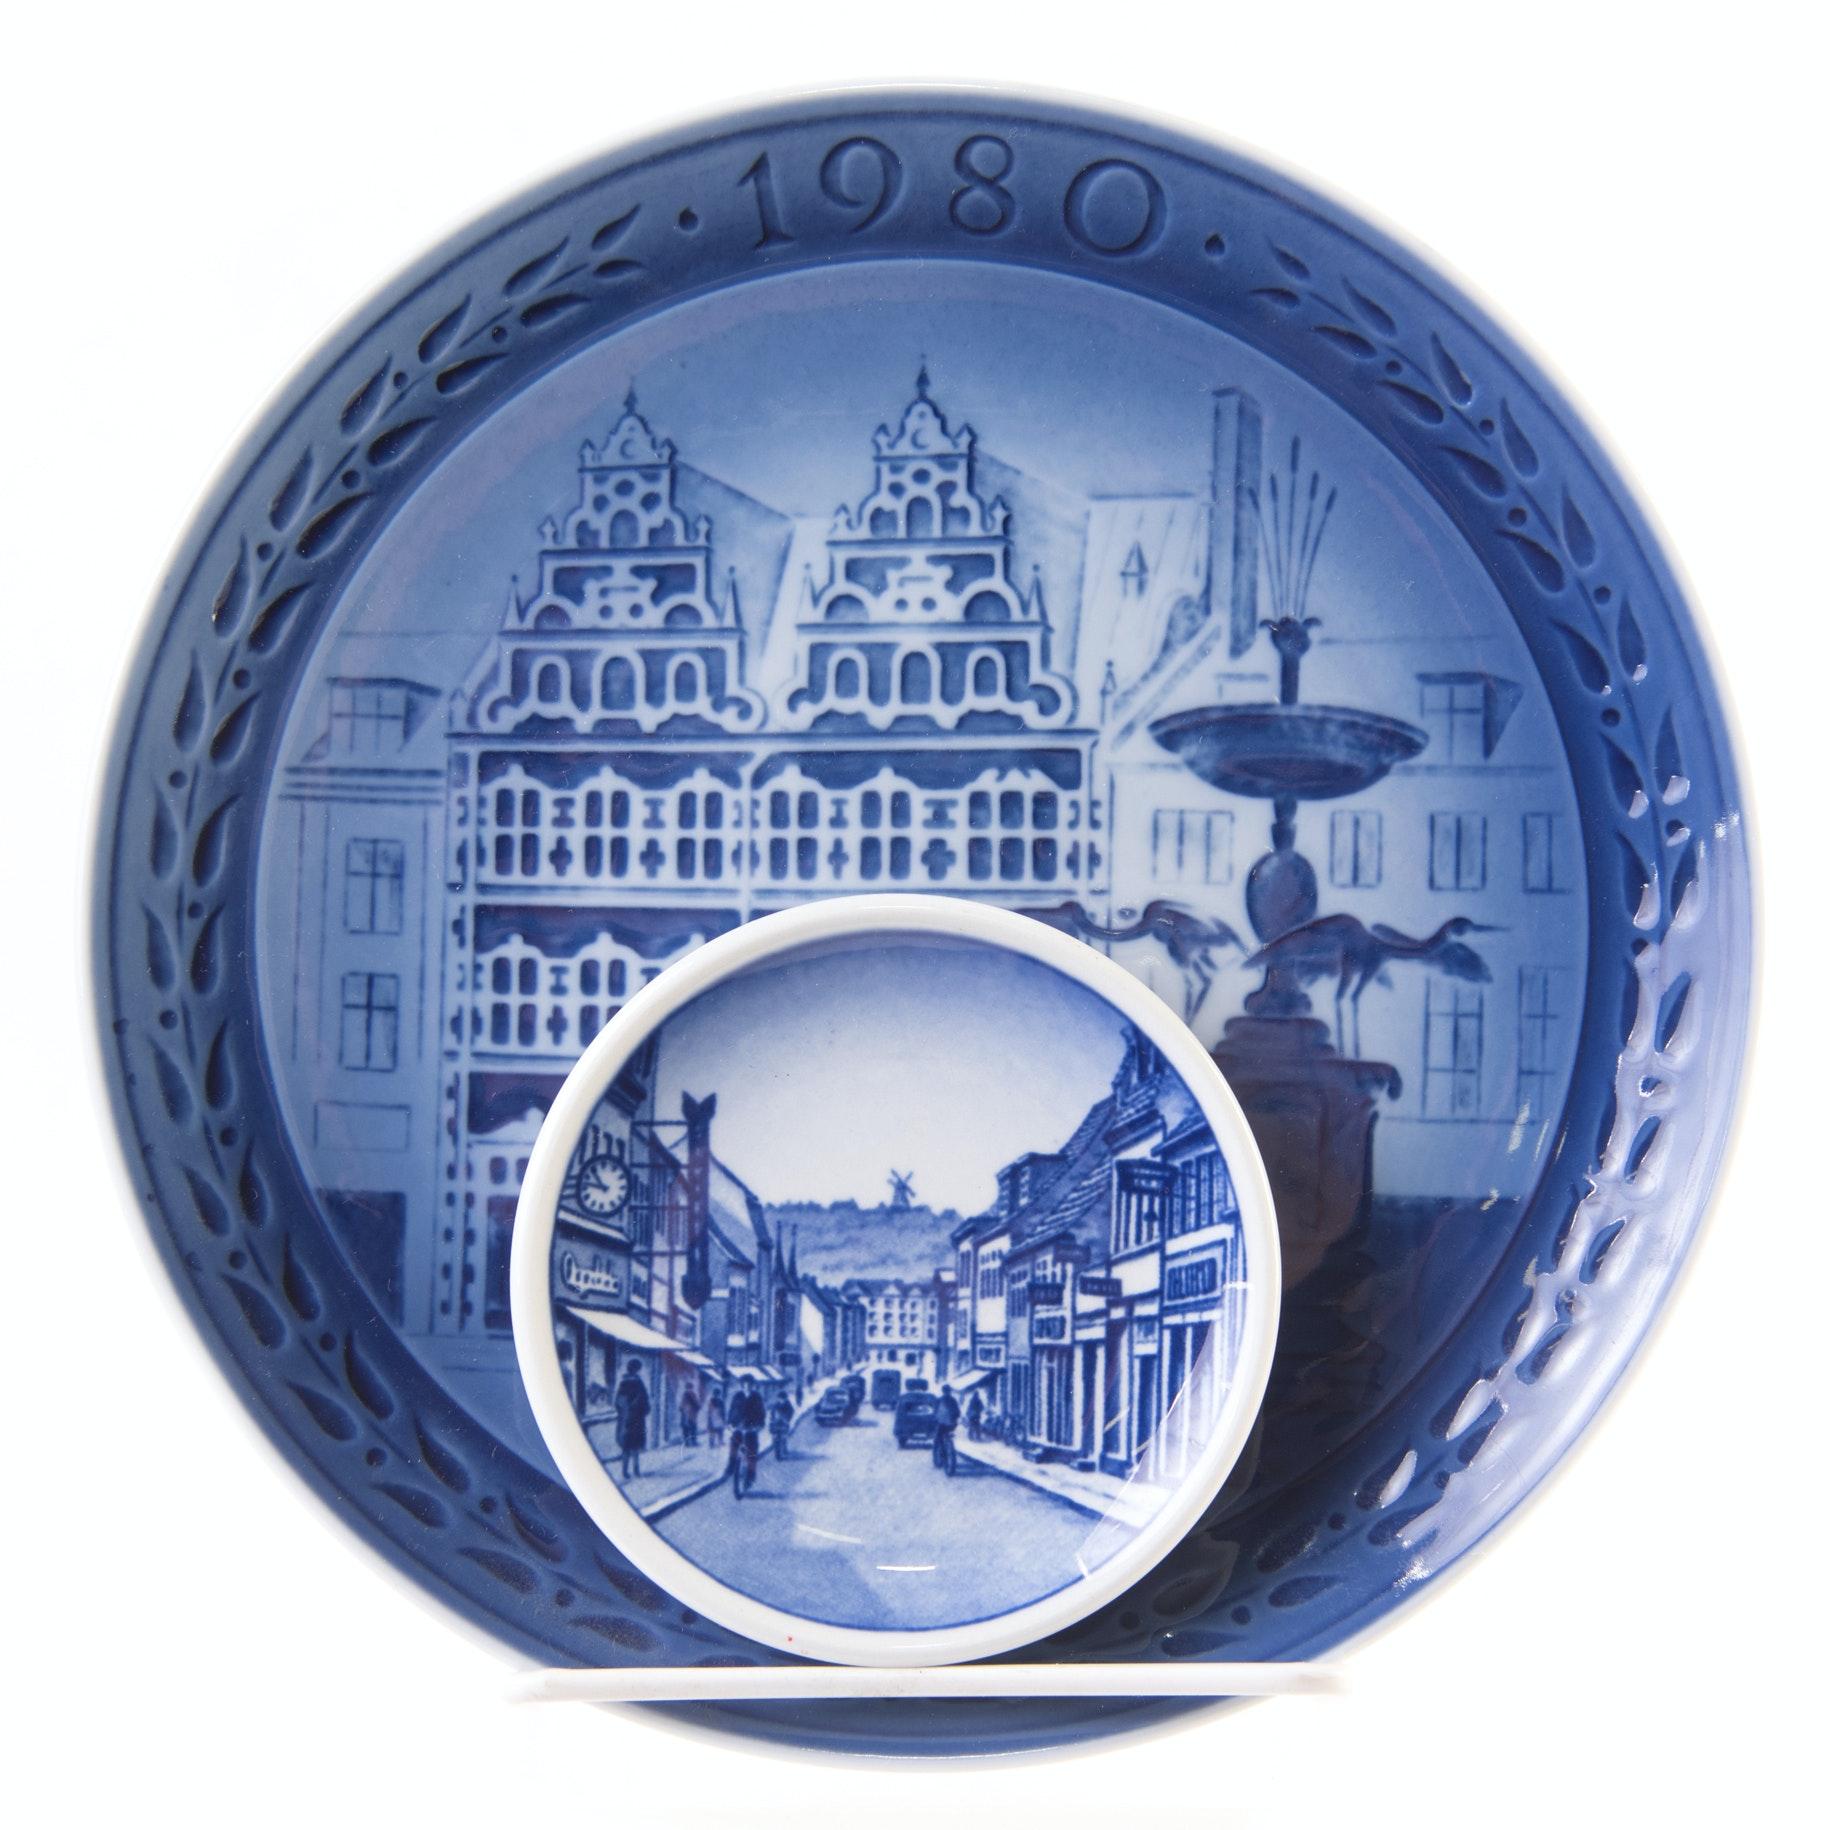 Vintage Royal Copenhagen Plates